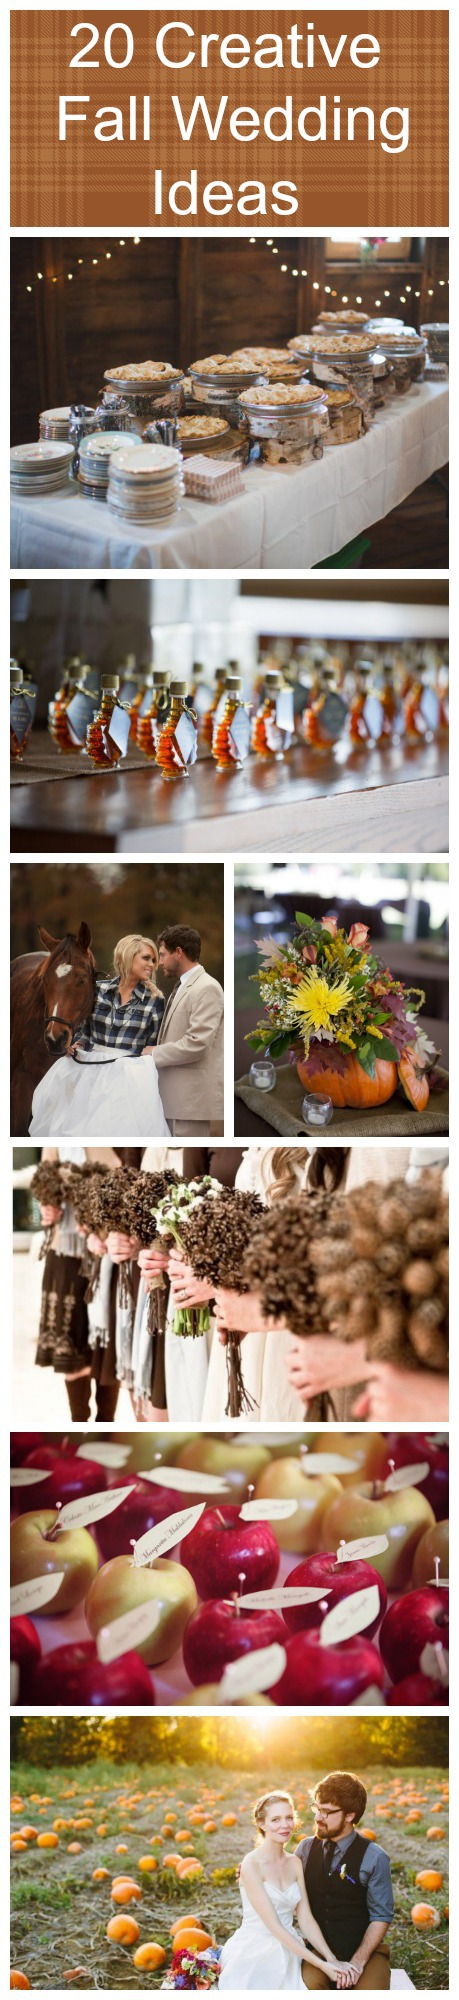 Creative fall wedding ideas rustic chic